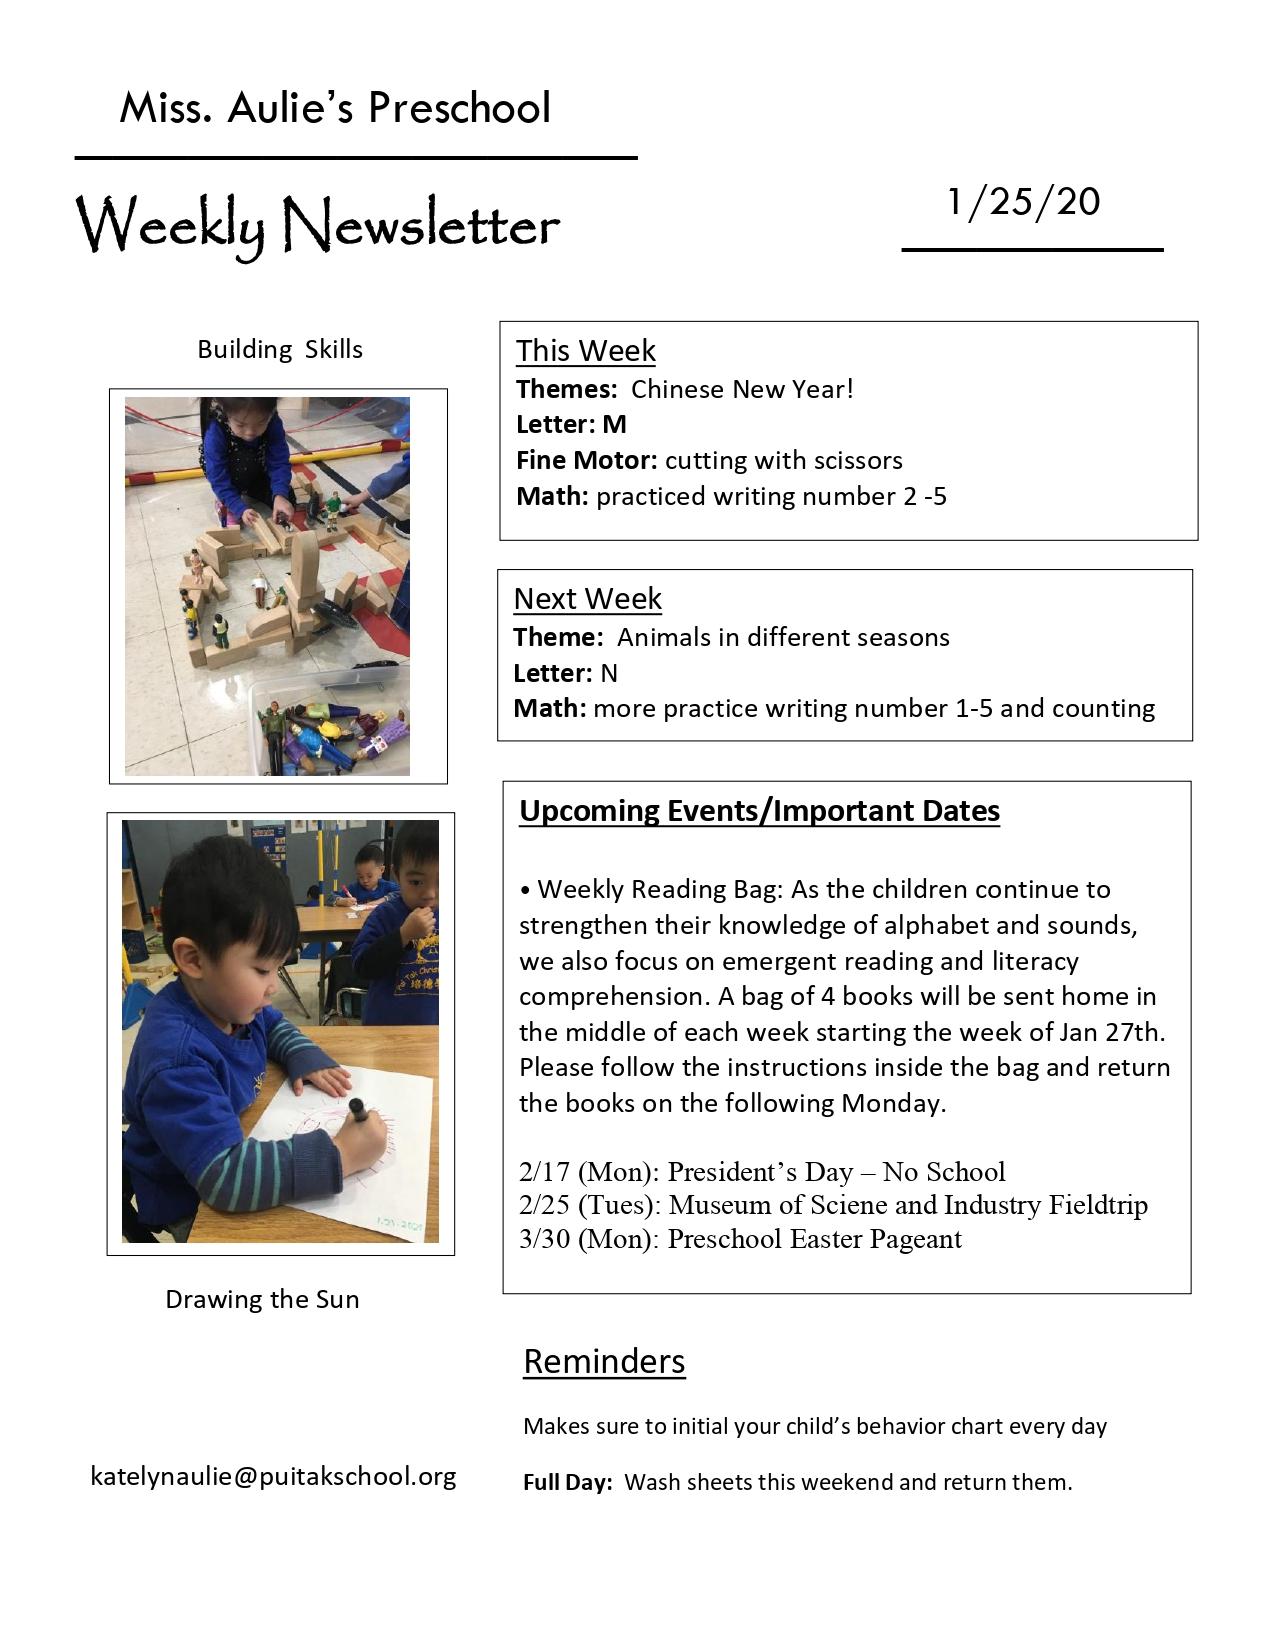 KatelynNewsletter2020January4thWeek_page